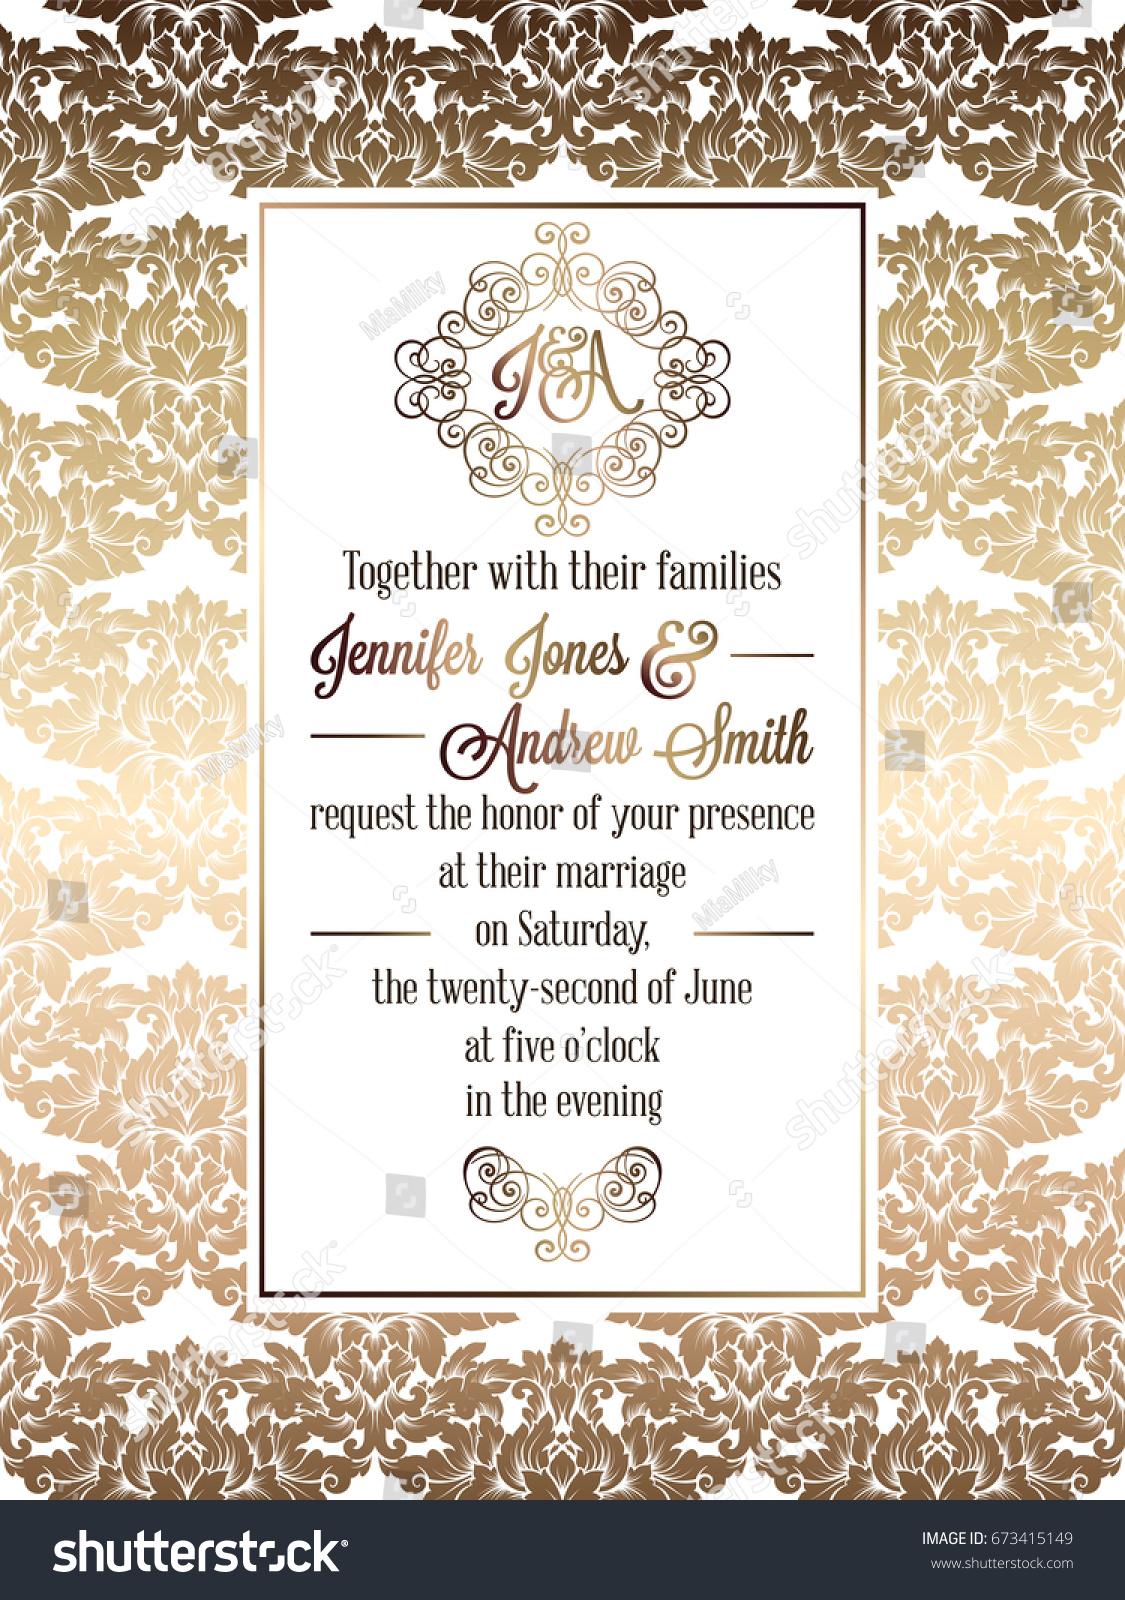 Vintage baroque style wedding invitation card stock vector vintage baroque style wedding invitation card template elegant formal design with damask background stopboris Images